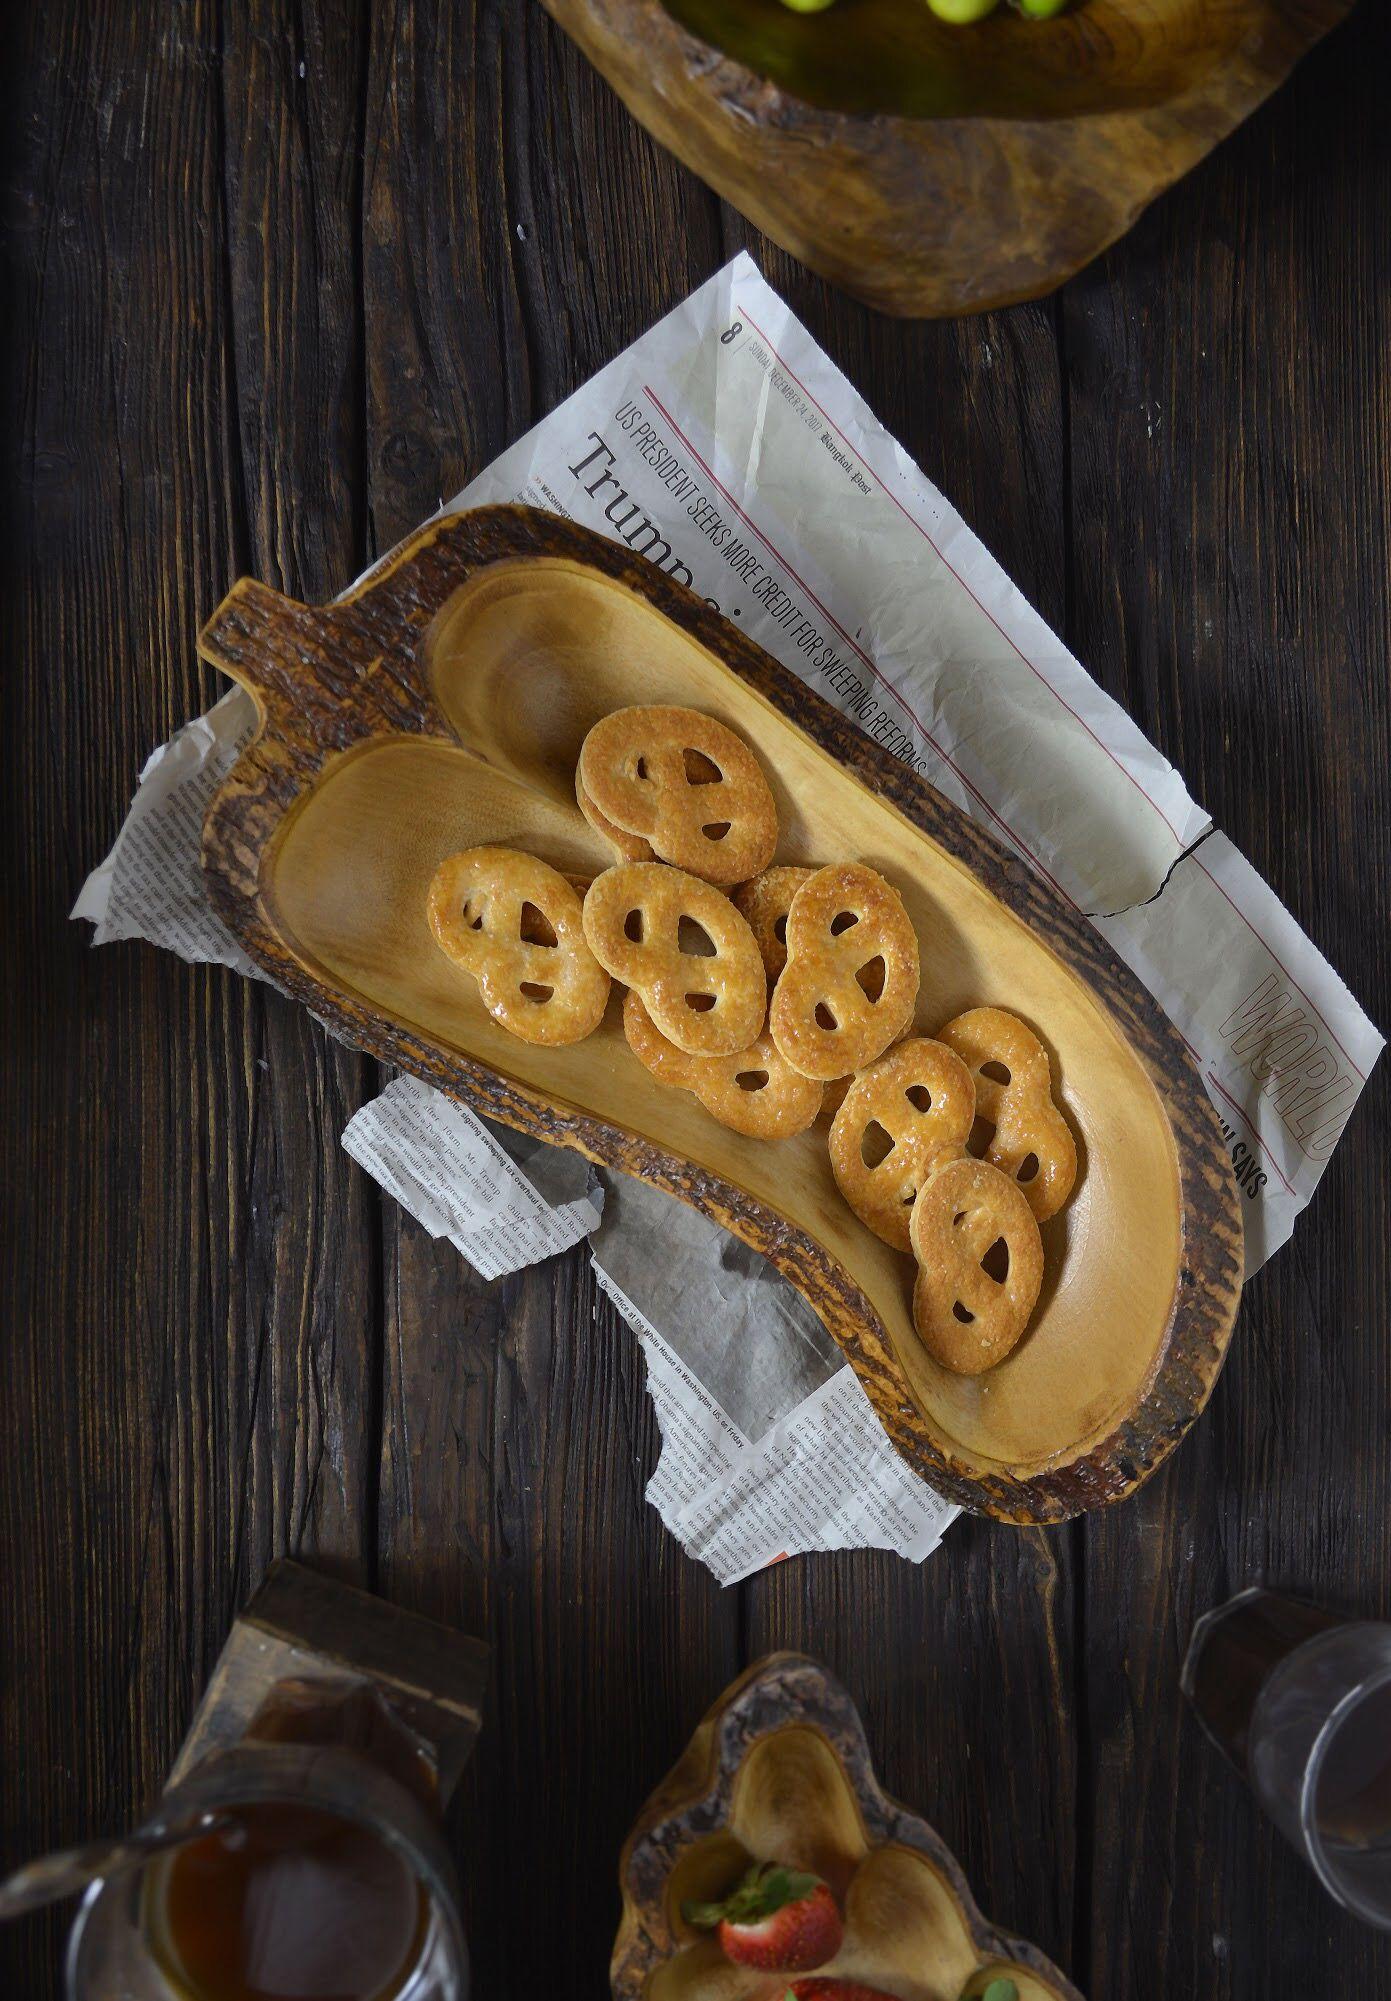 Pin By Deem Home On صواني خشب واوني منزلية Desserts Sugar Cookie Food